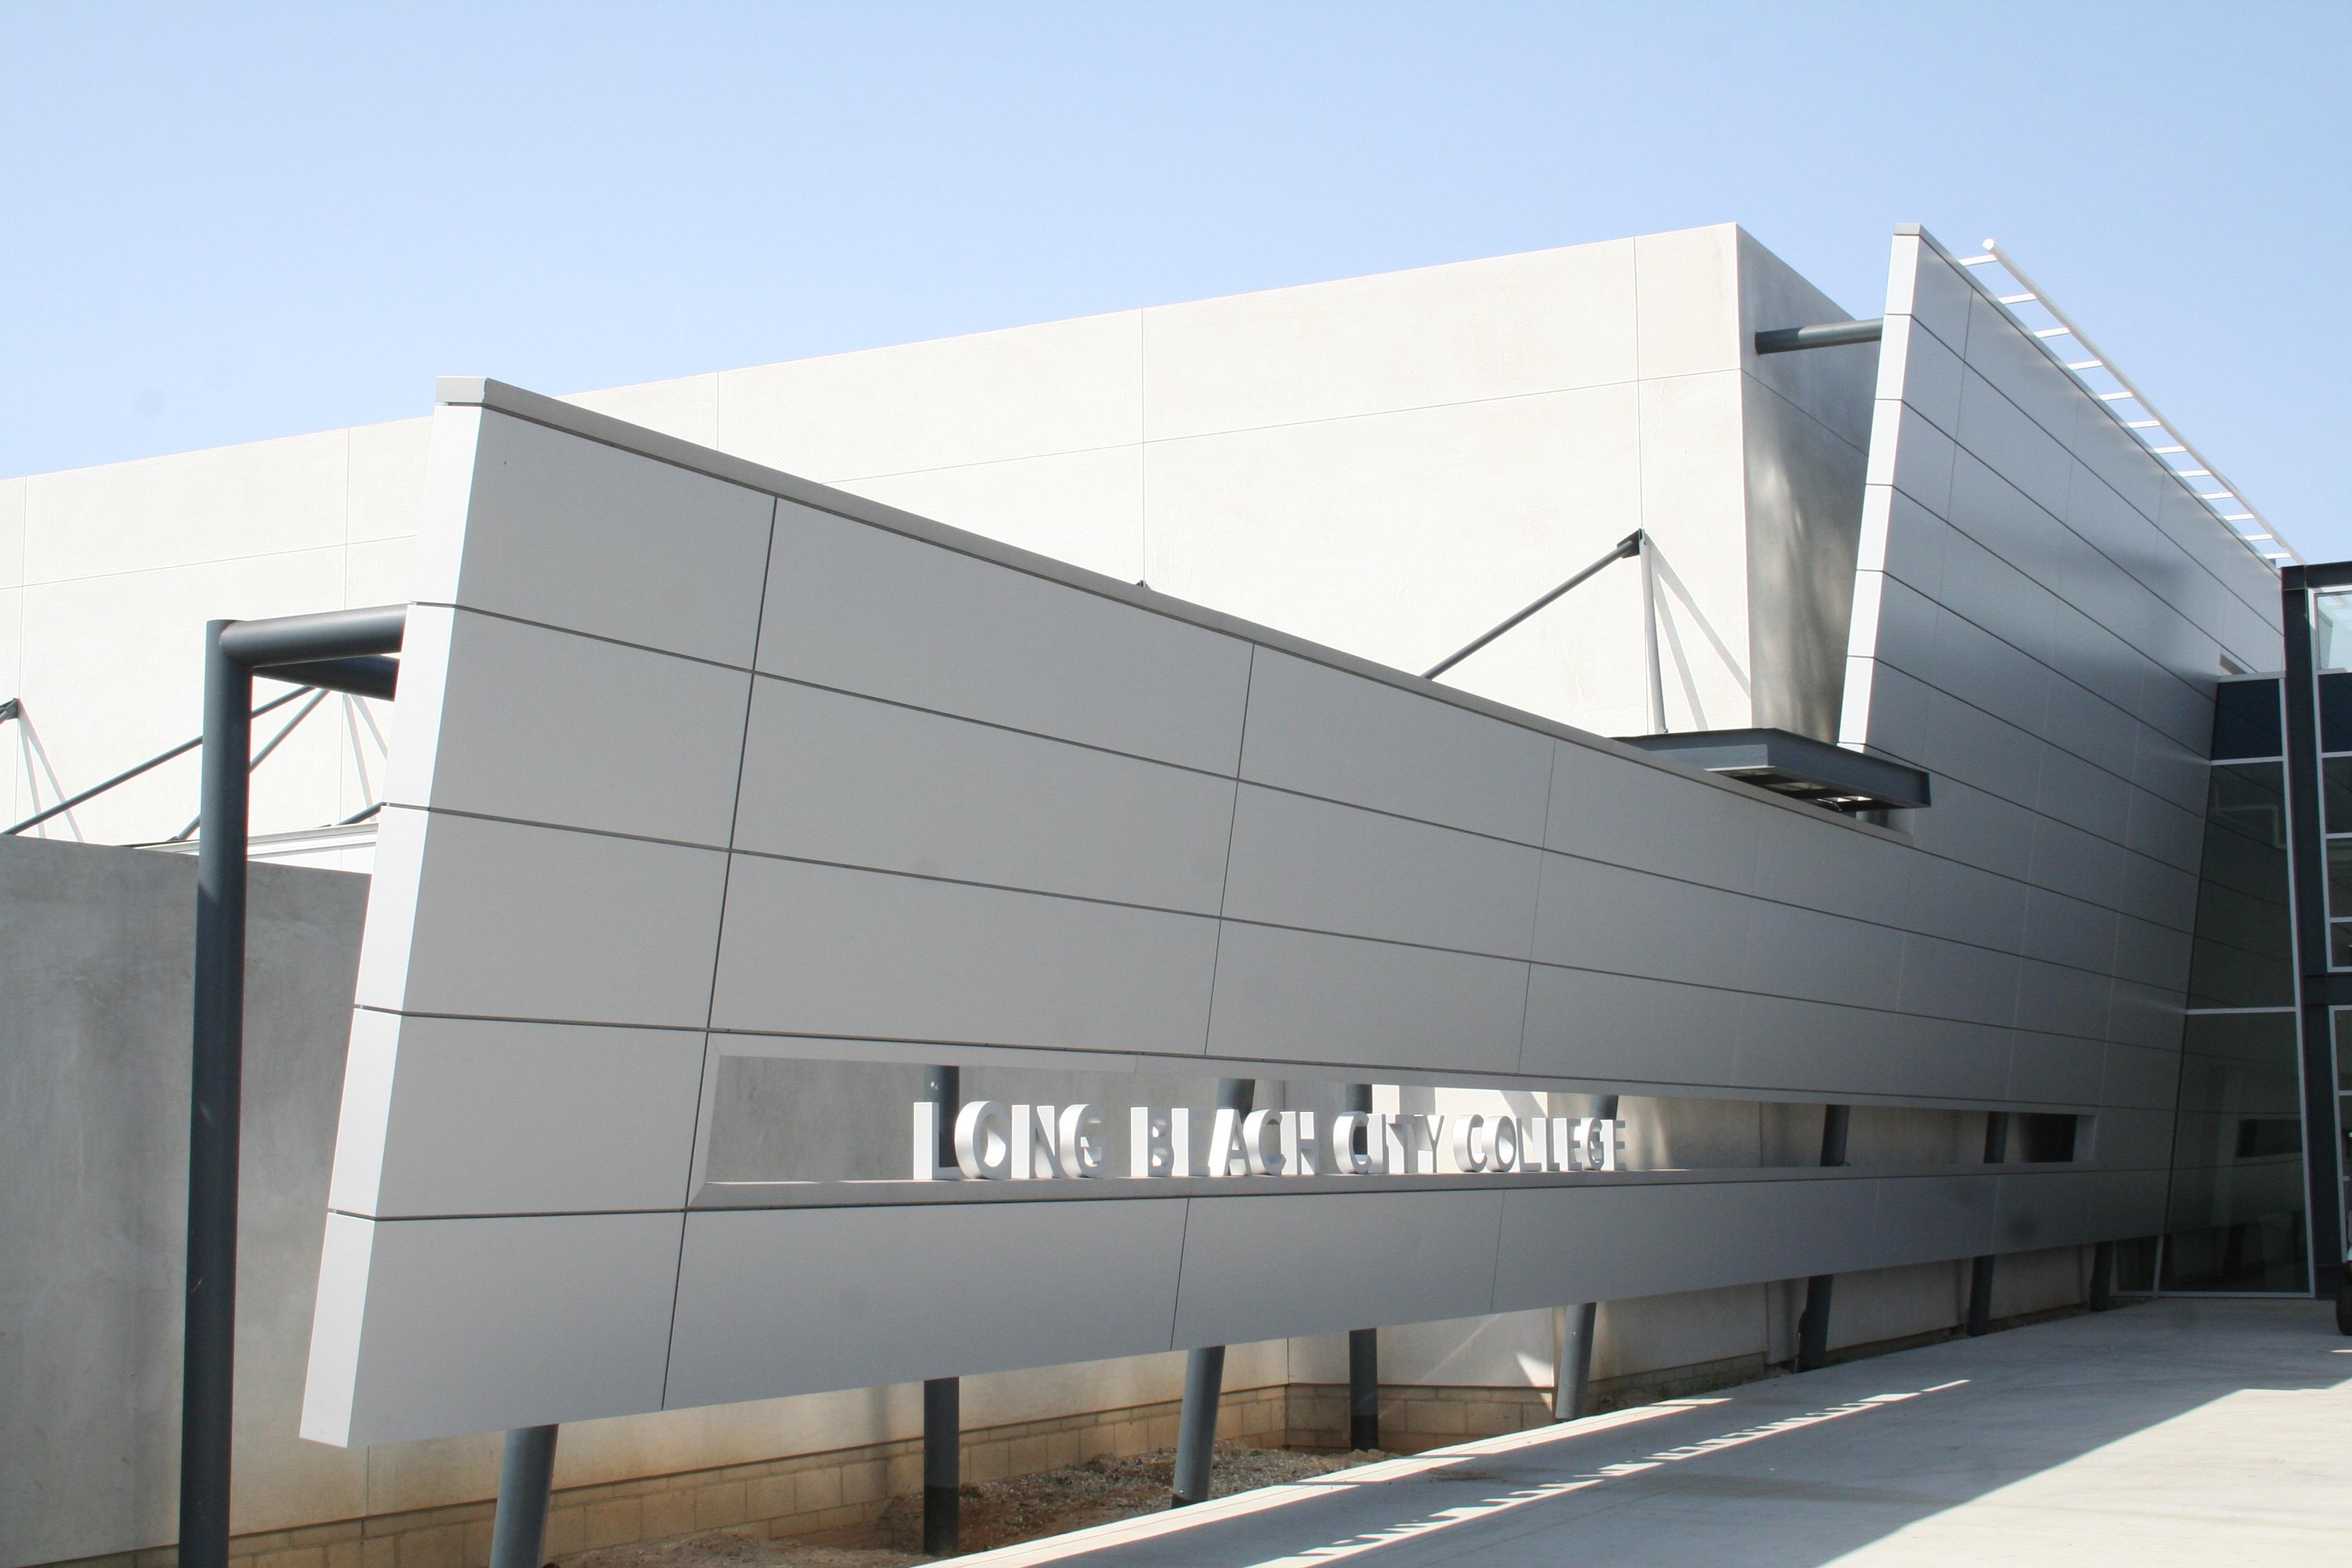 Long Beach 001 (1)